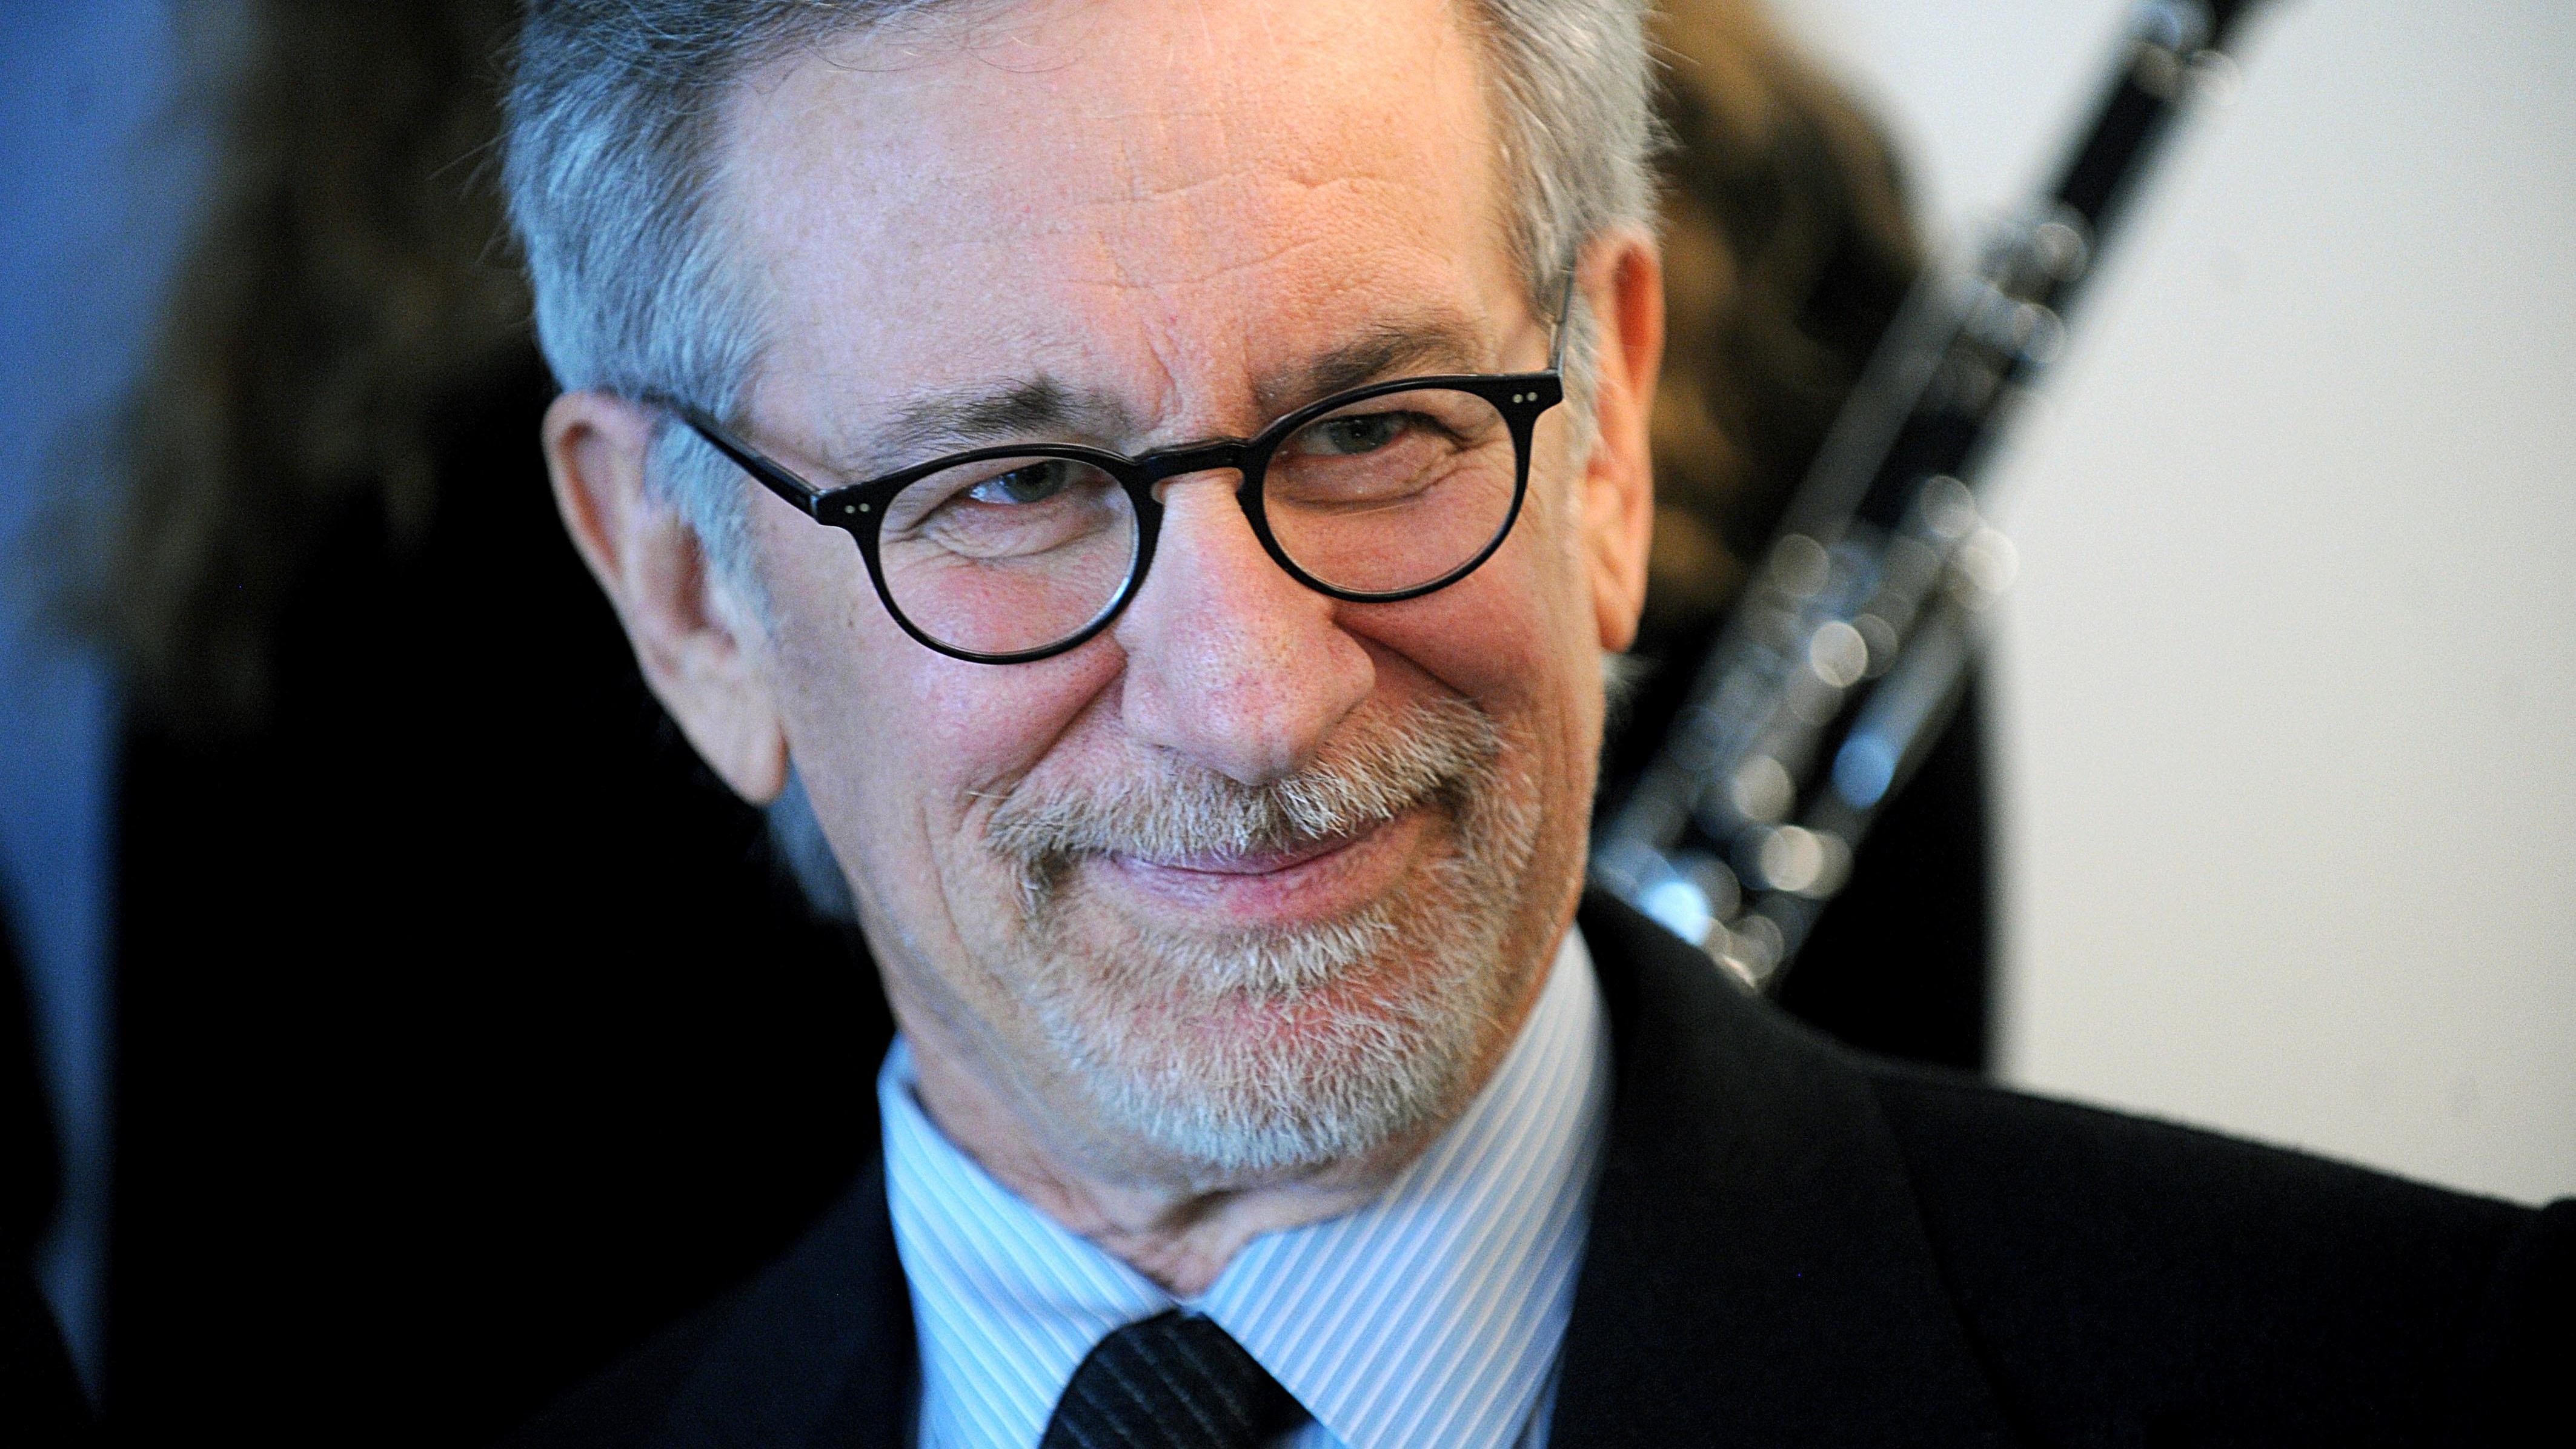 Steven Spielberg, dinosaur killer? Funniest reactions to (fake) viral photo